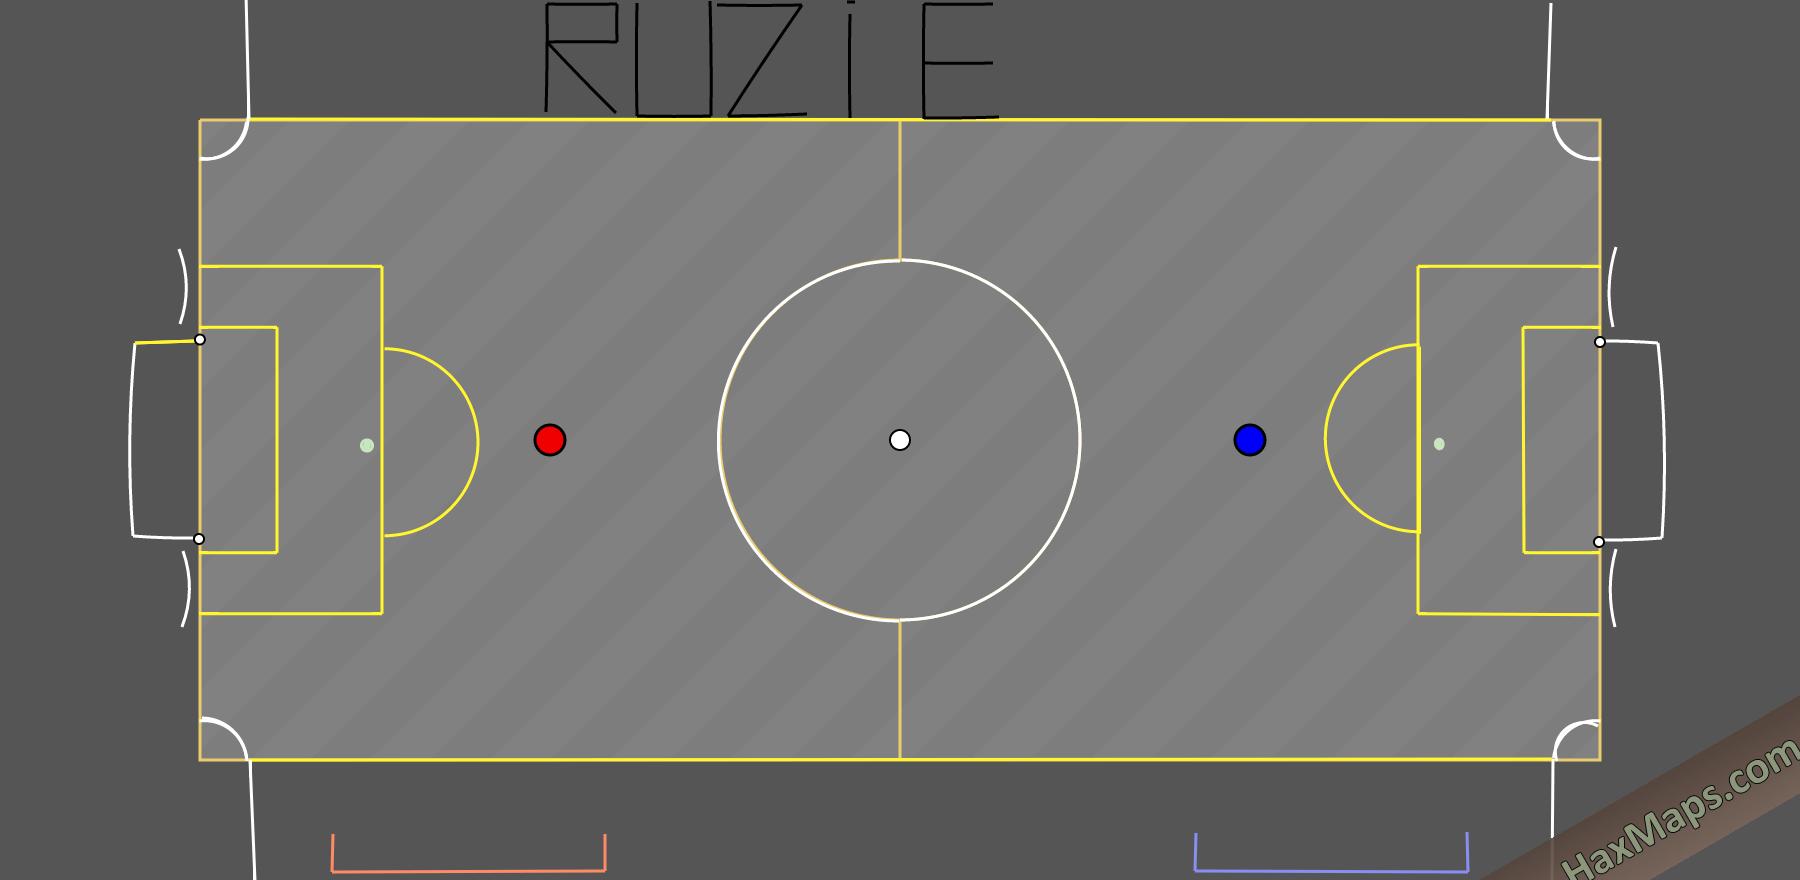 hax ball maps | Futsal Real Soccer V3 Kul